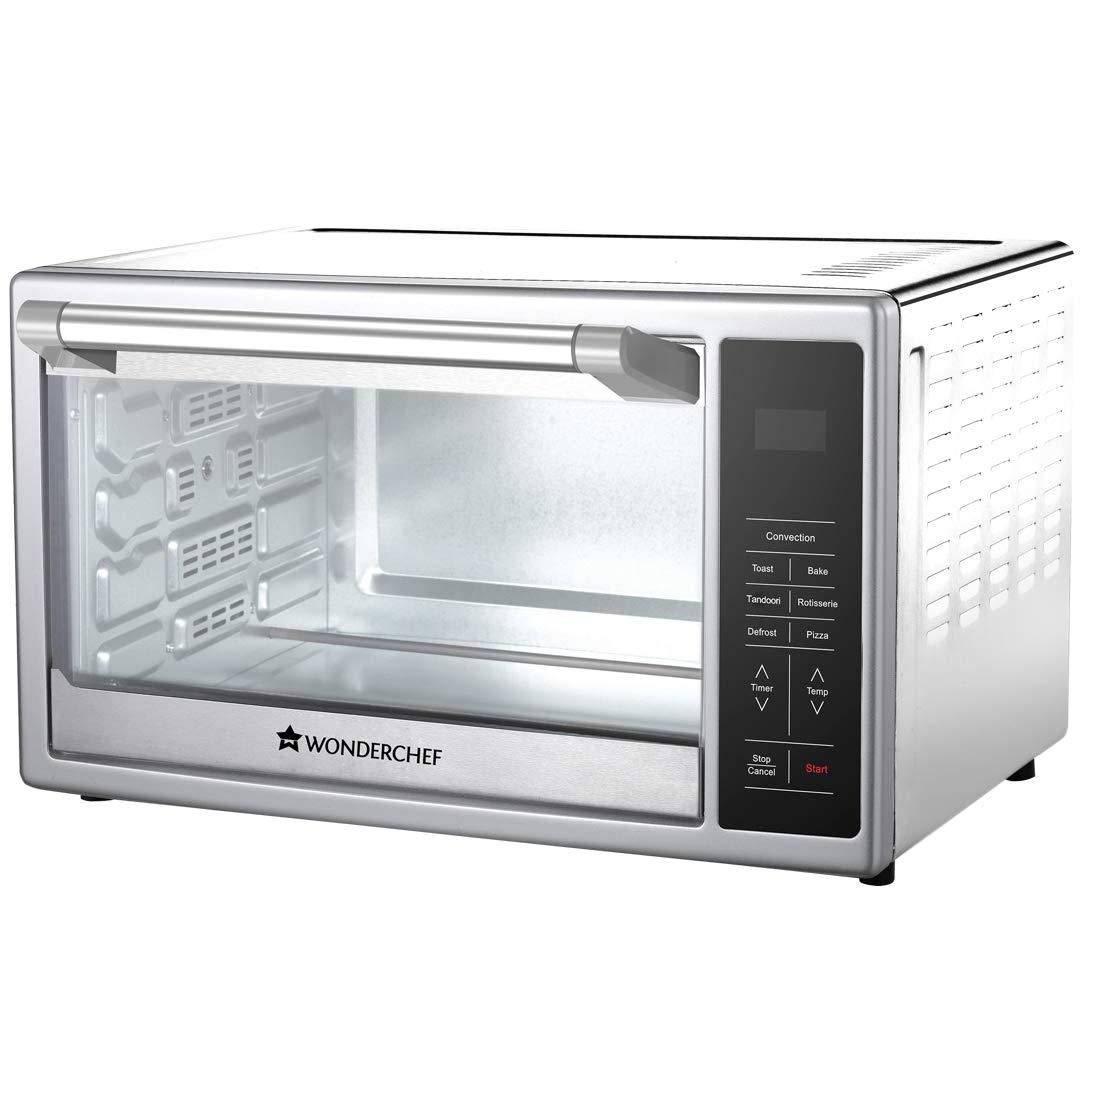 Wonderchef Prato Digital OTG 30L (wonderful option of best OTG Oven for baking and grilling)